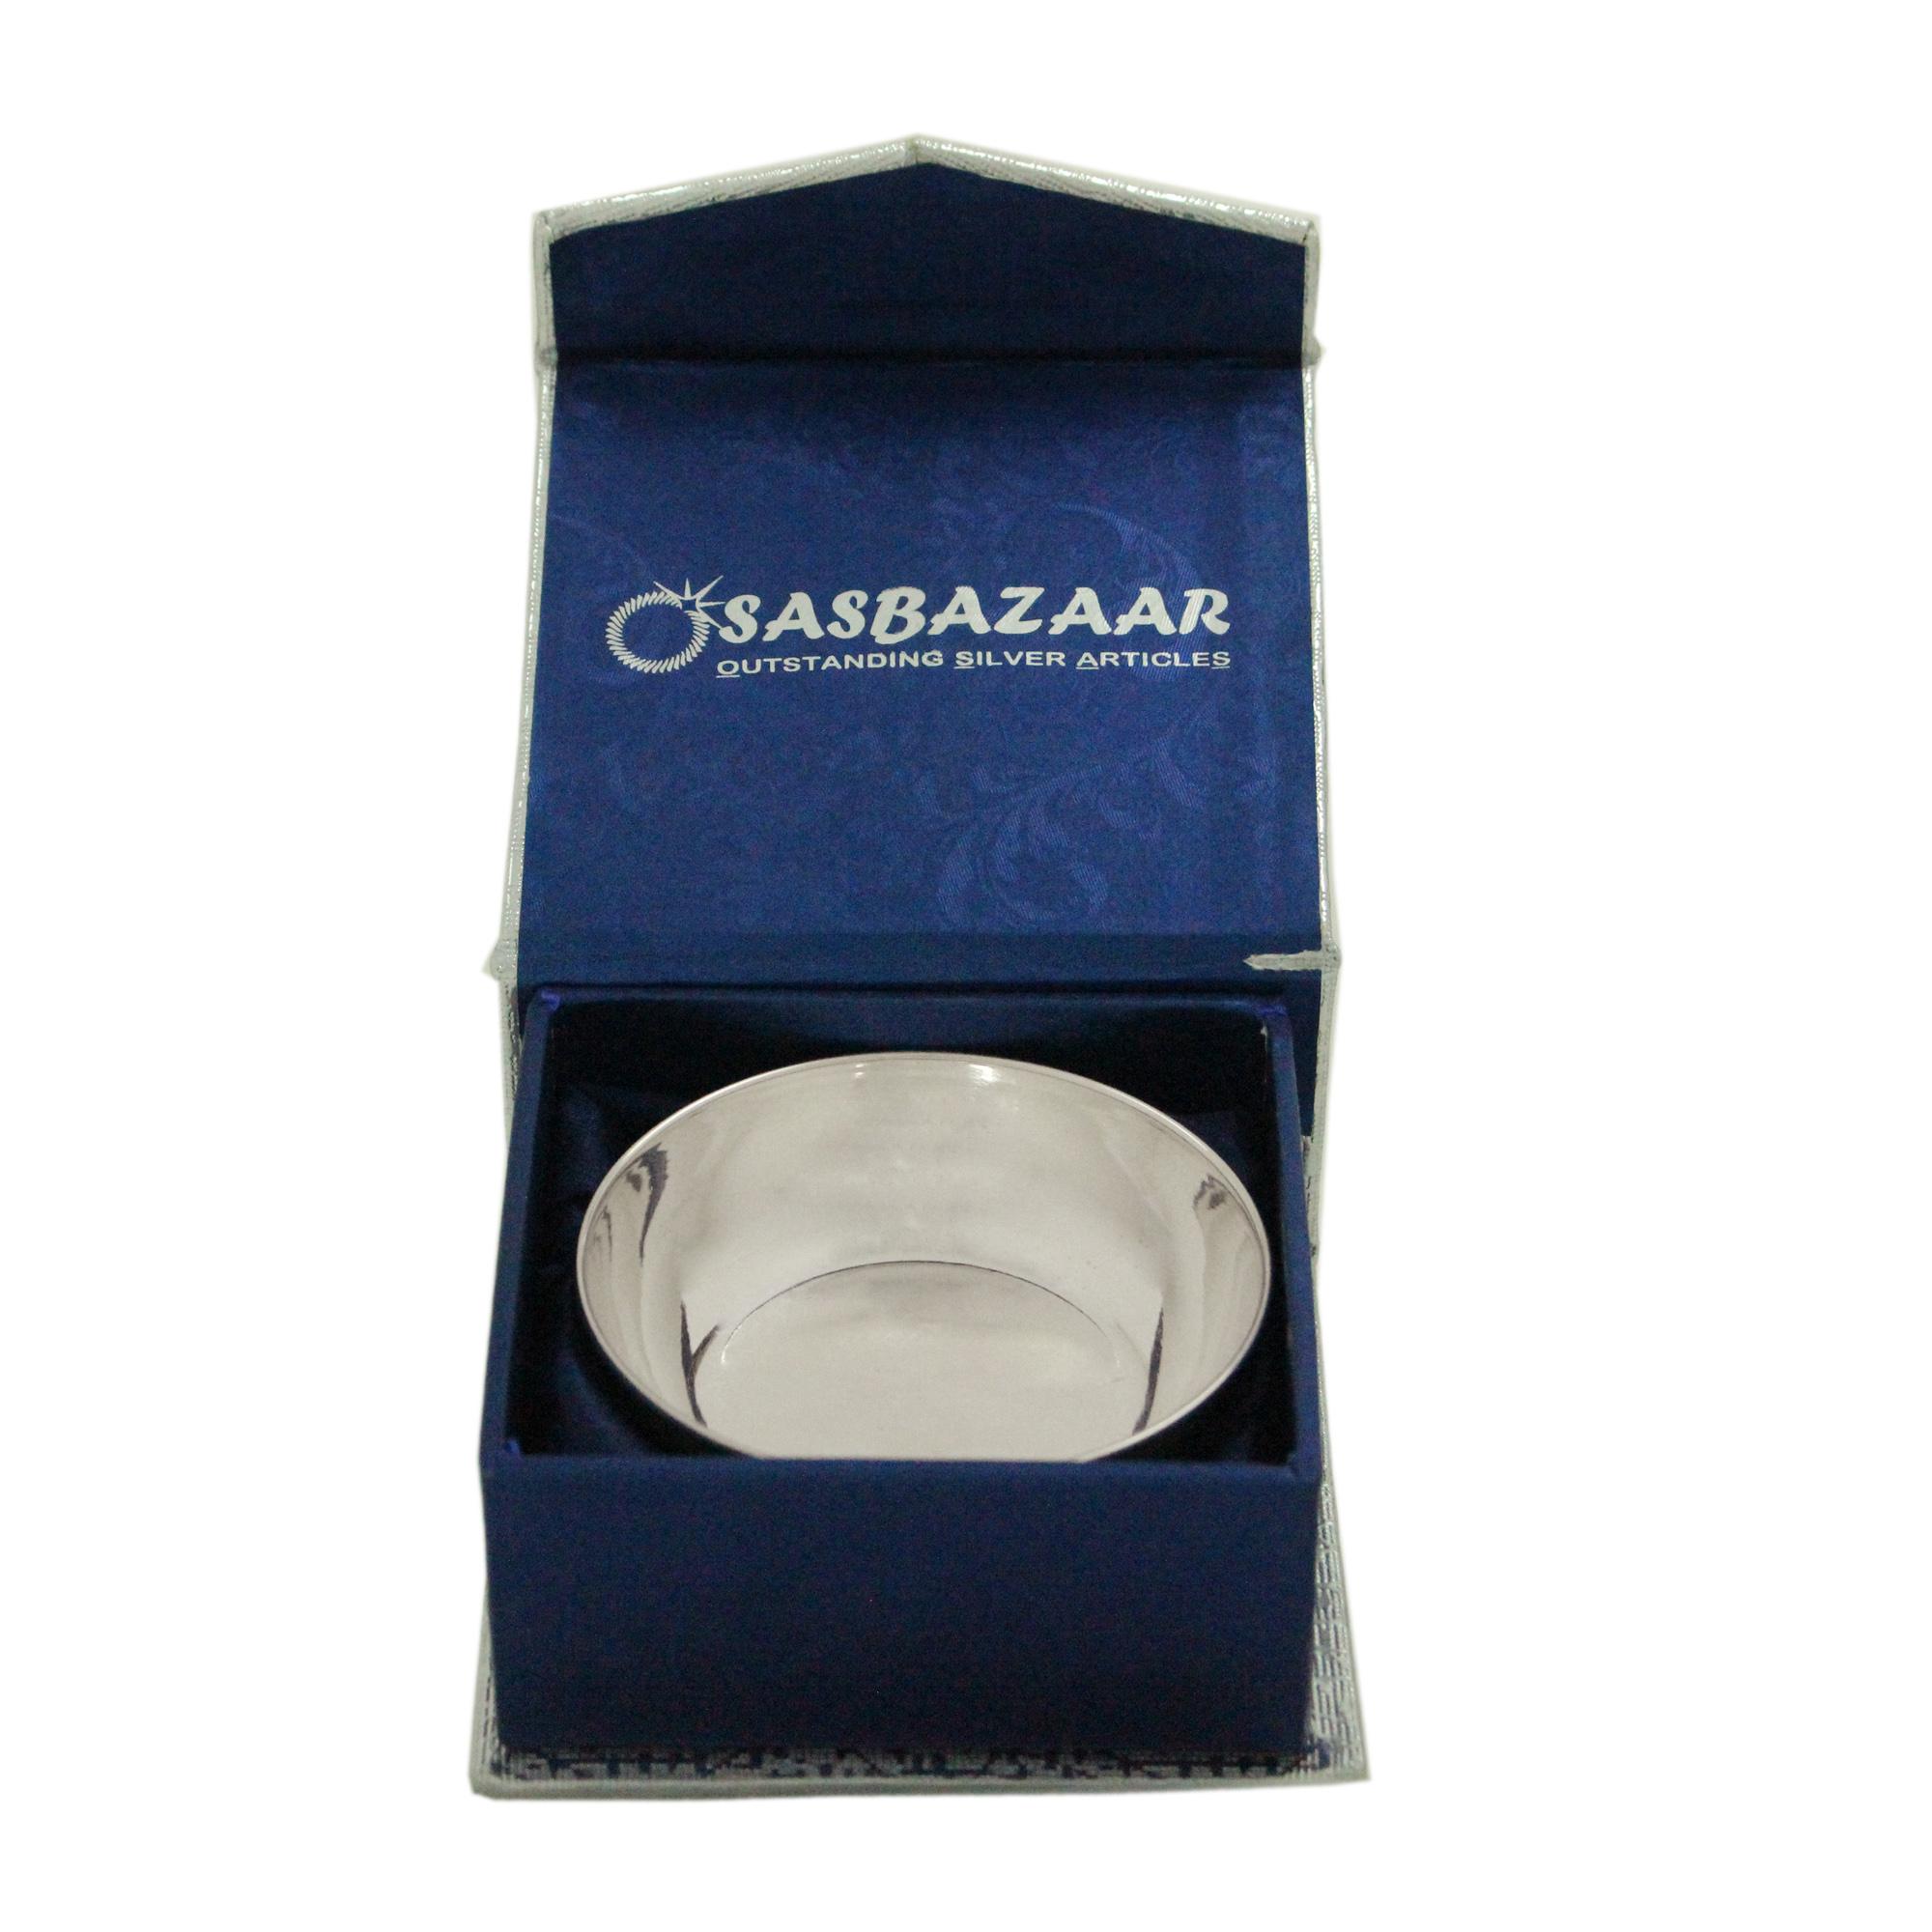 Bowl Baby 50 ml in Silver by Osasbazaar Packaging